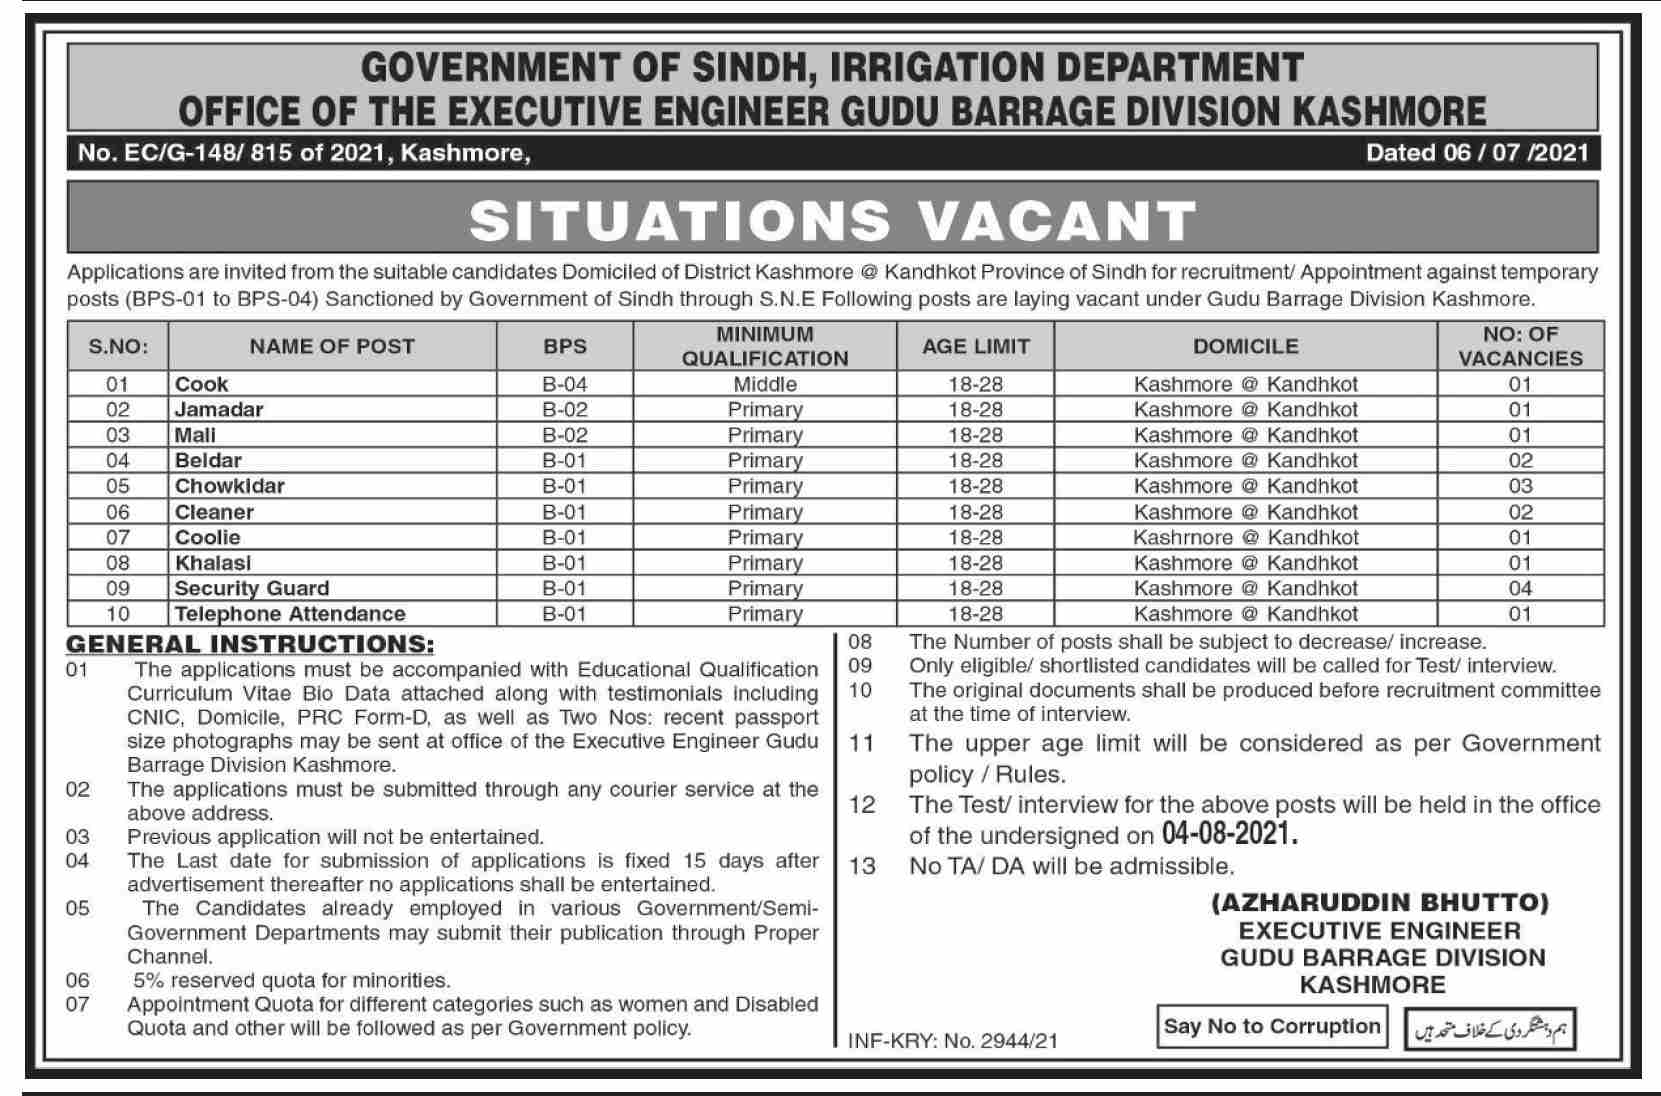 Govt of Sindh Irrigation Department Jobs 2021